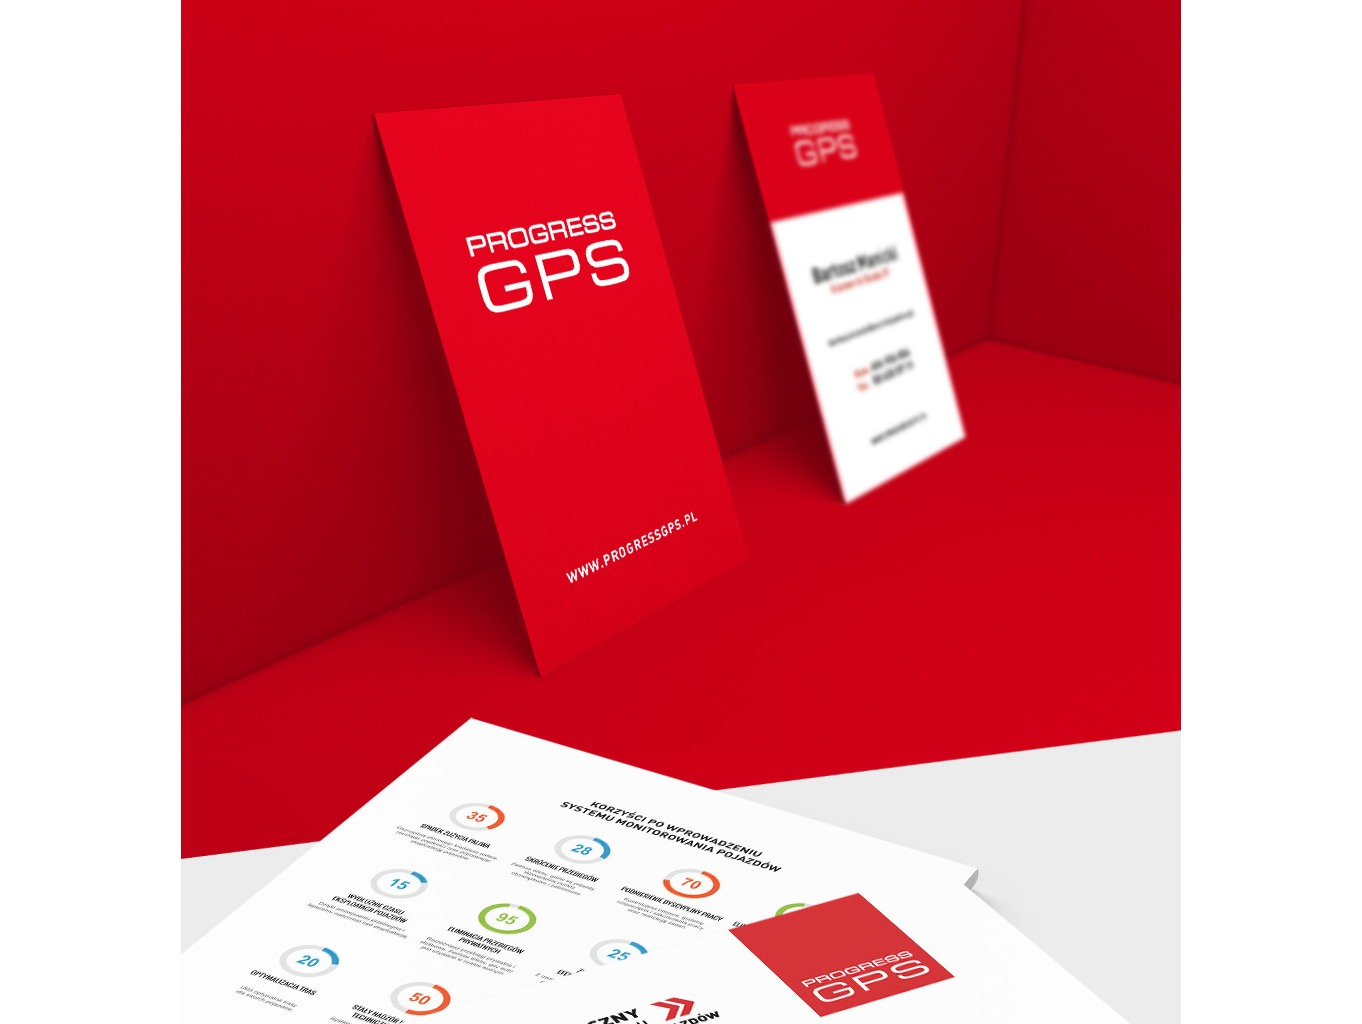 Progress GPS 2